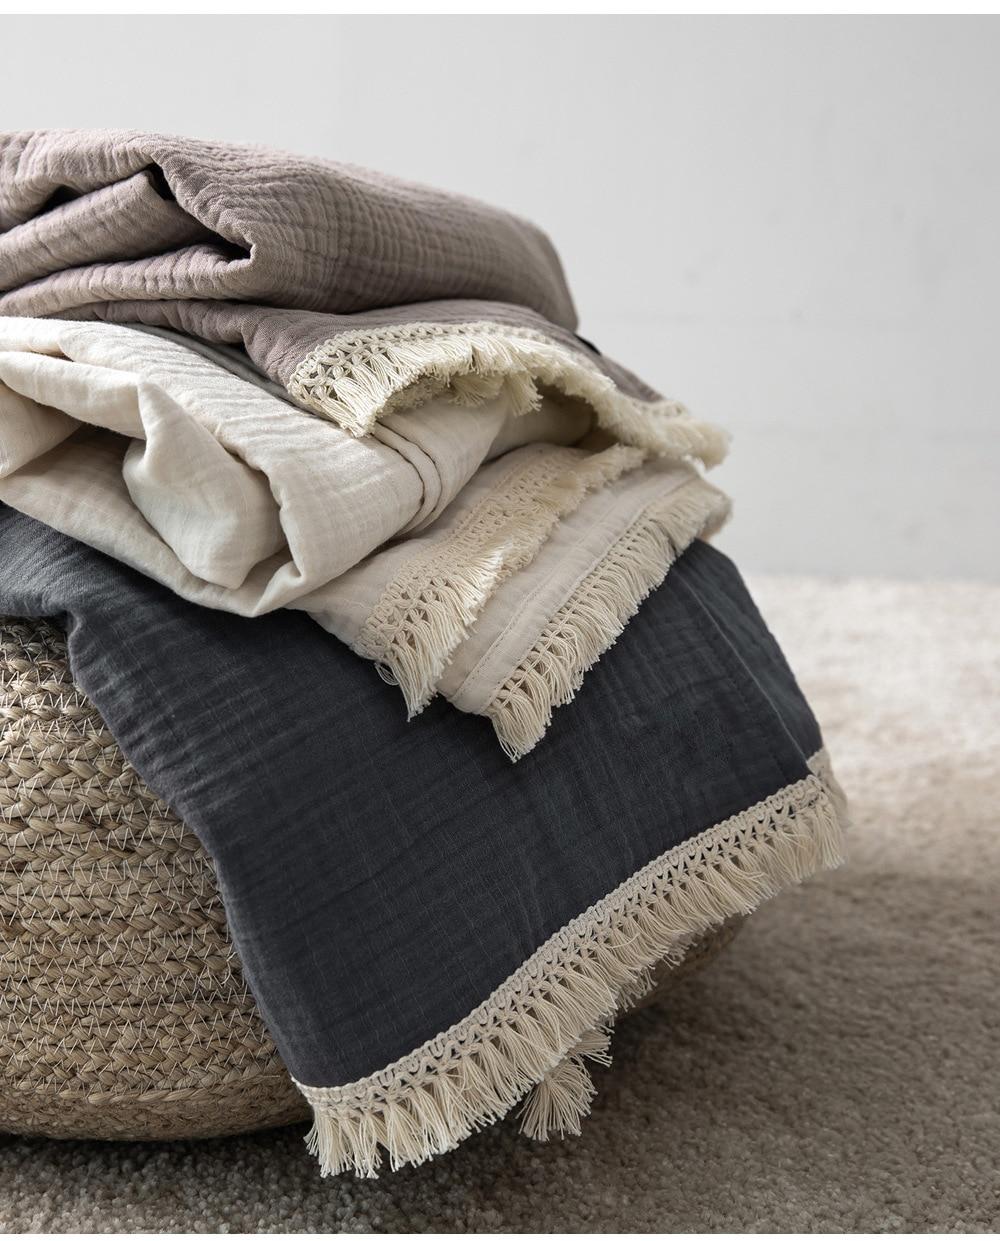 Cotton Muslin Baby Blanket With Tassel 4 Layers Summer Bed Sheet Bedspread Cotton Bath Towel Baby Receiving Blanket